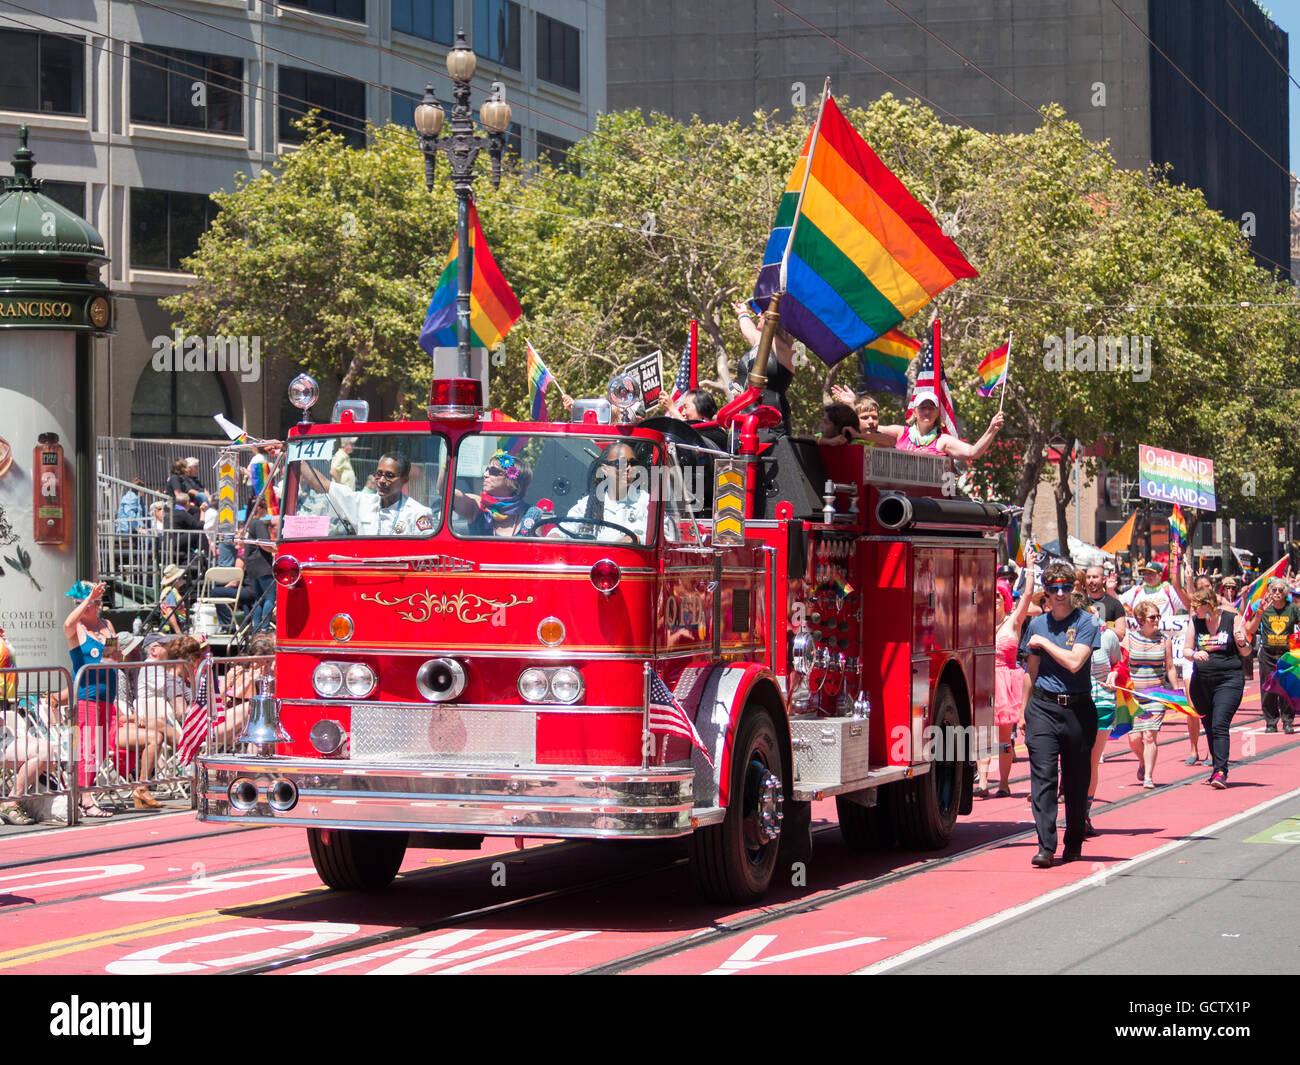 United States Fireman Stock Photos & United States Fireman